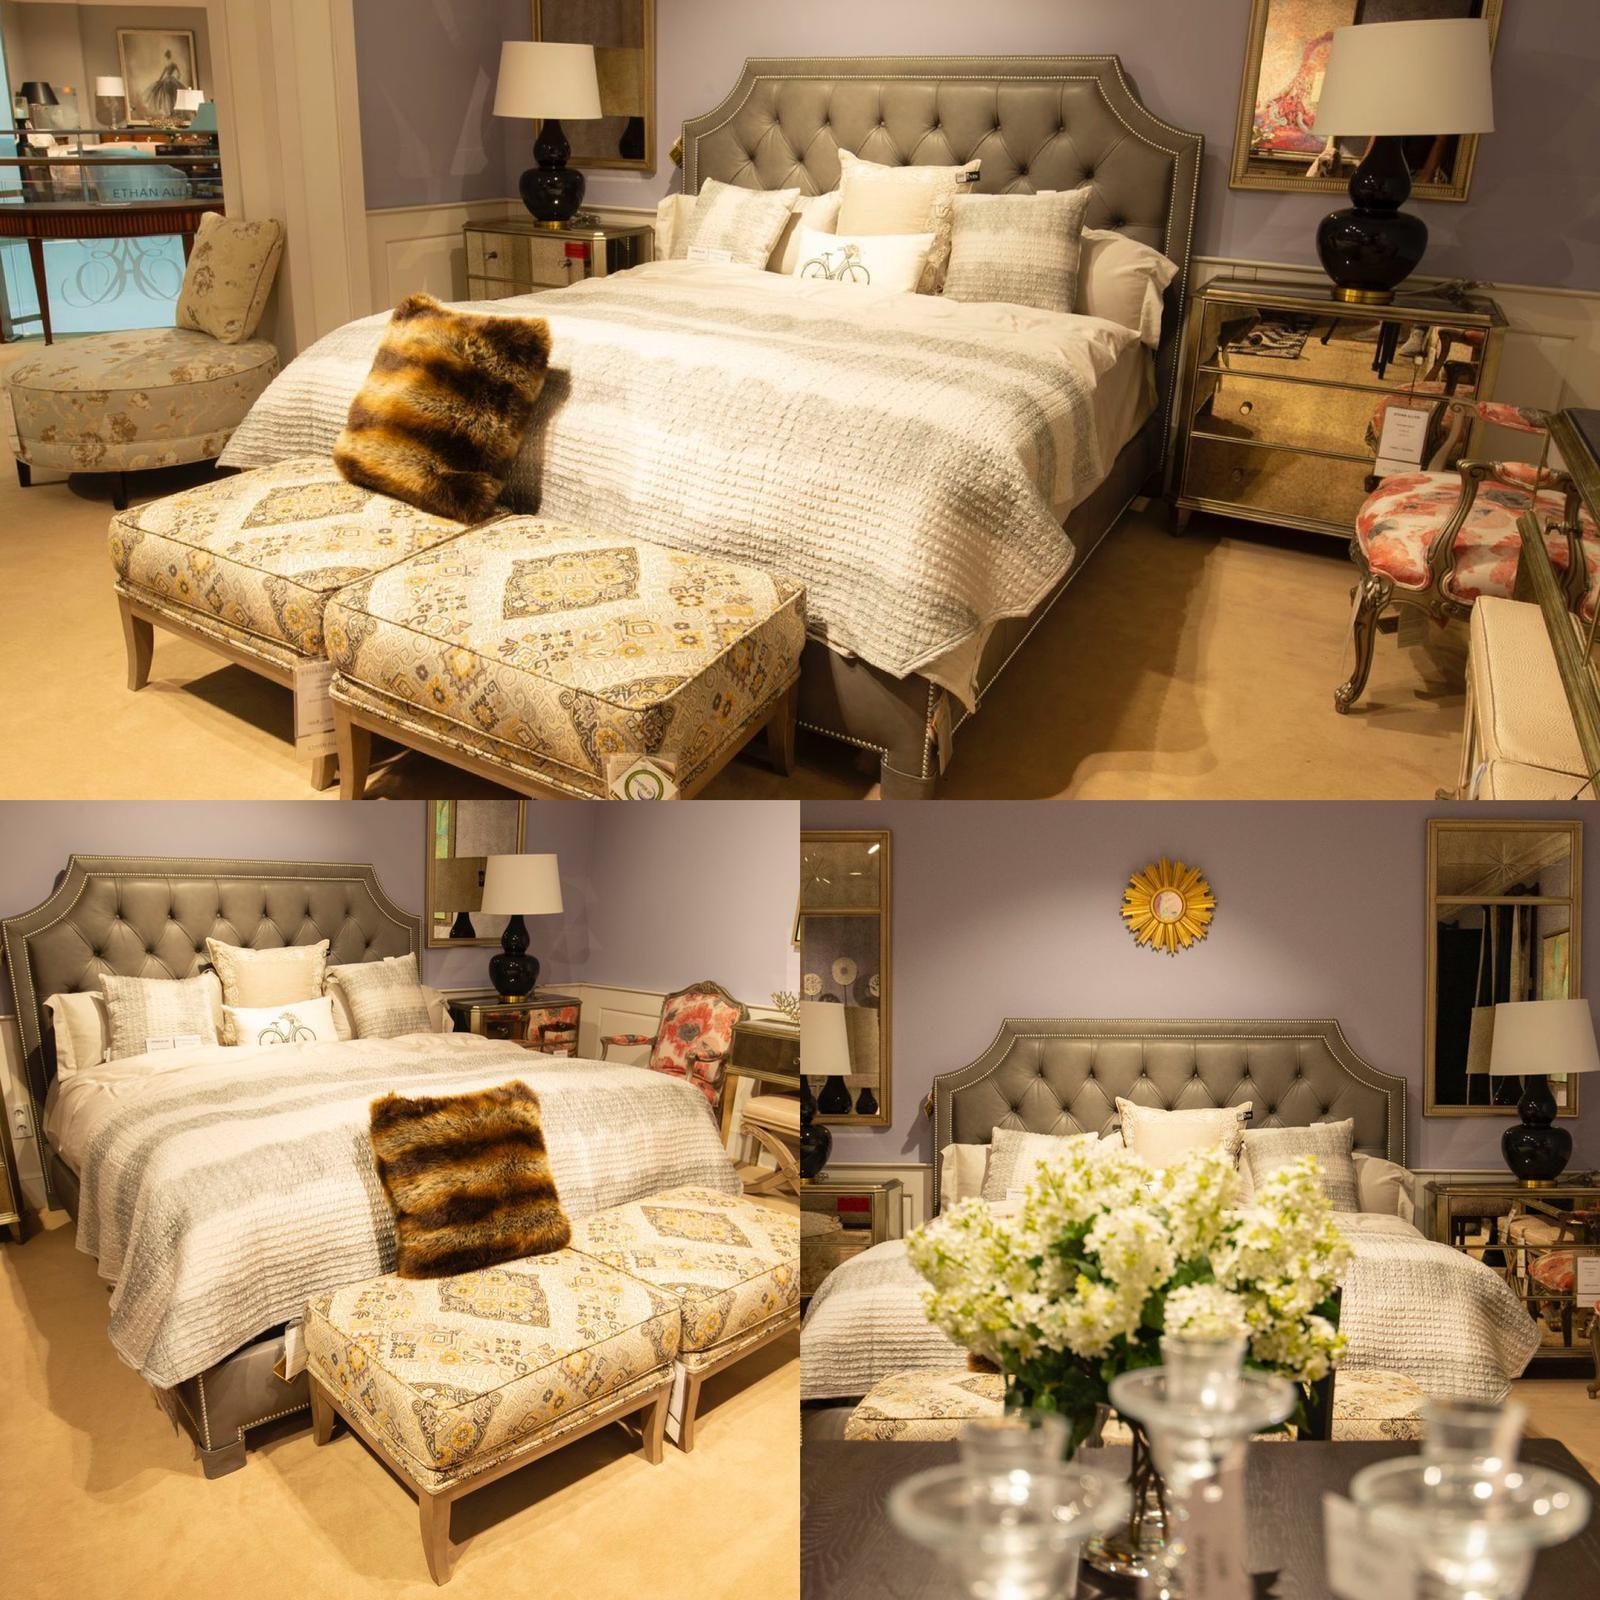 Patul Alison este un best-seller marca Ethan Allen, tapitat cu piele. Butonii ce personalizeaza tablia adauga farmec si eleganta!  #selectdesignro #ethanallen #ethanallenromania #bedroom #leatherbed #bedroominspo #bedroomdecor #bedroomstyle